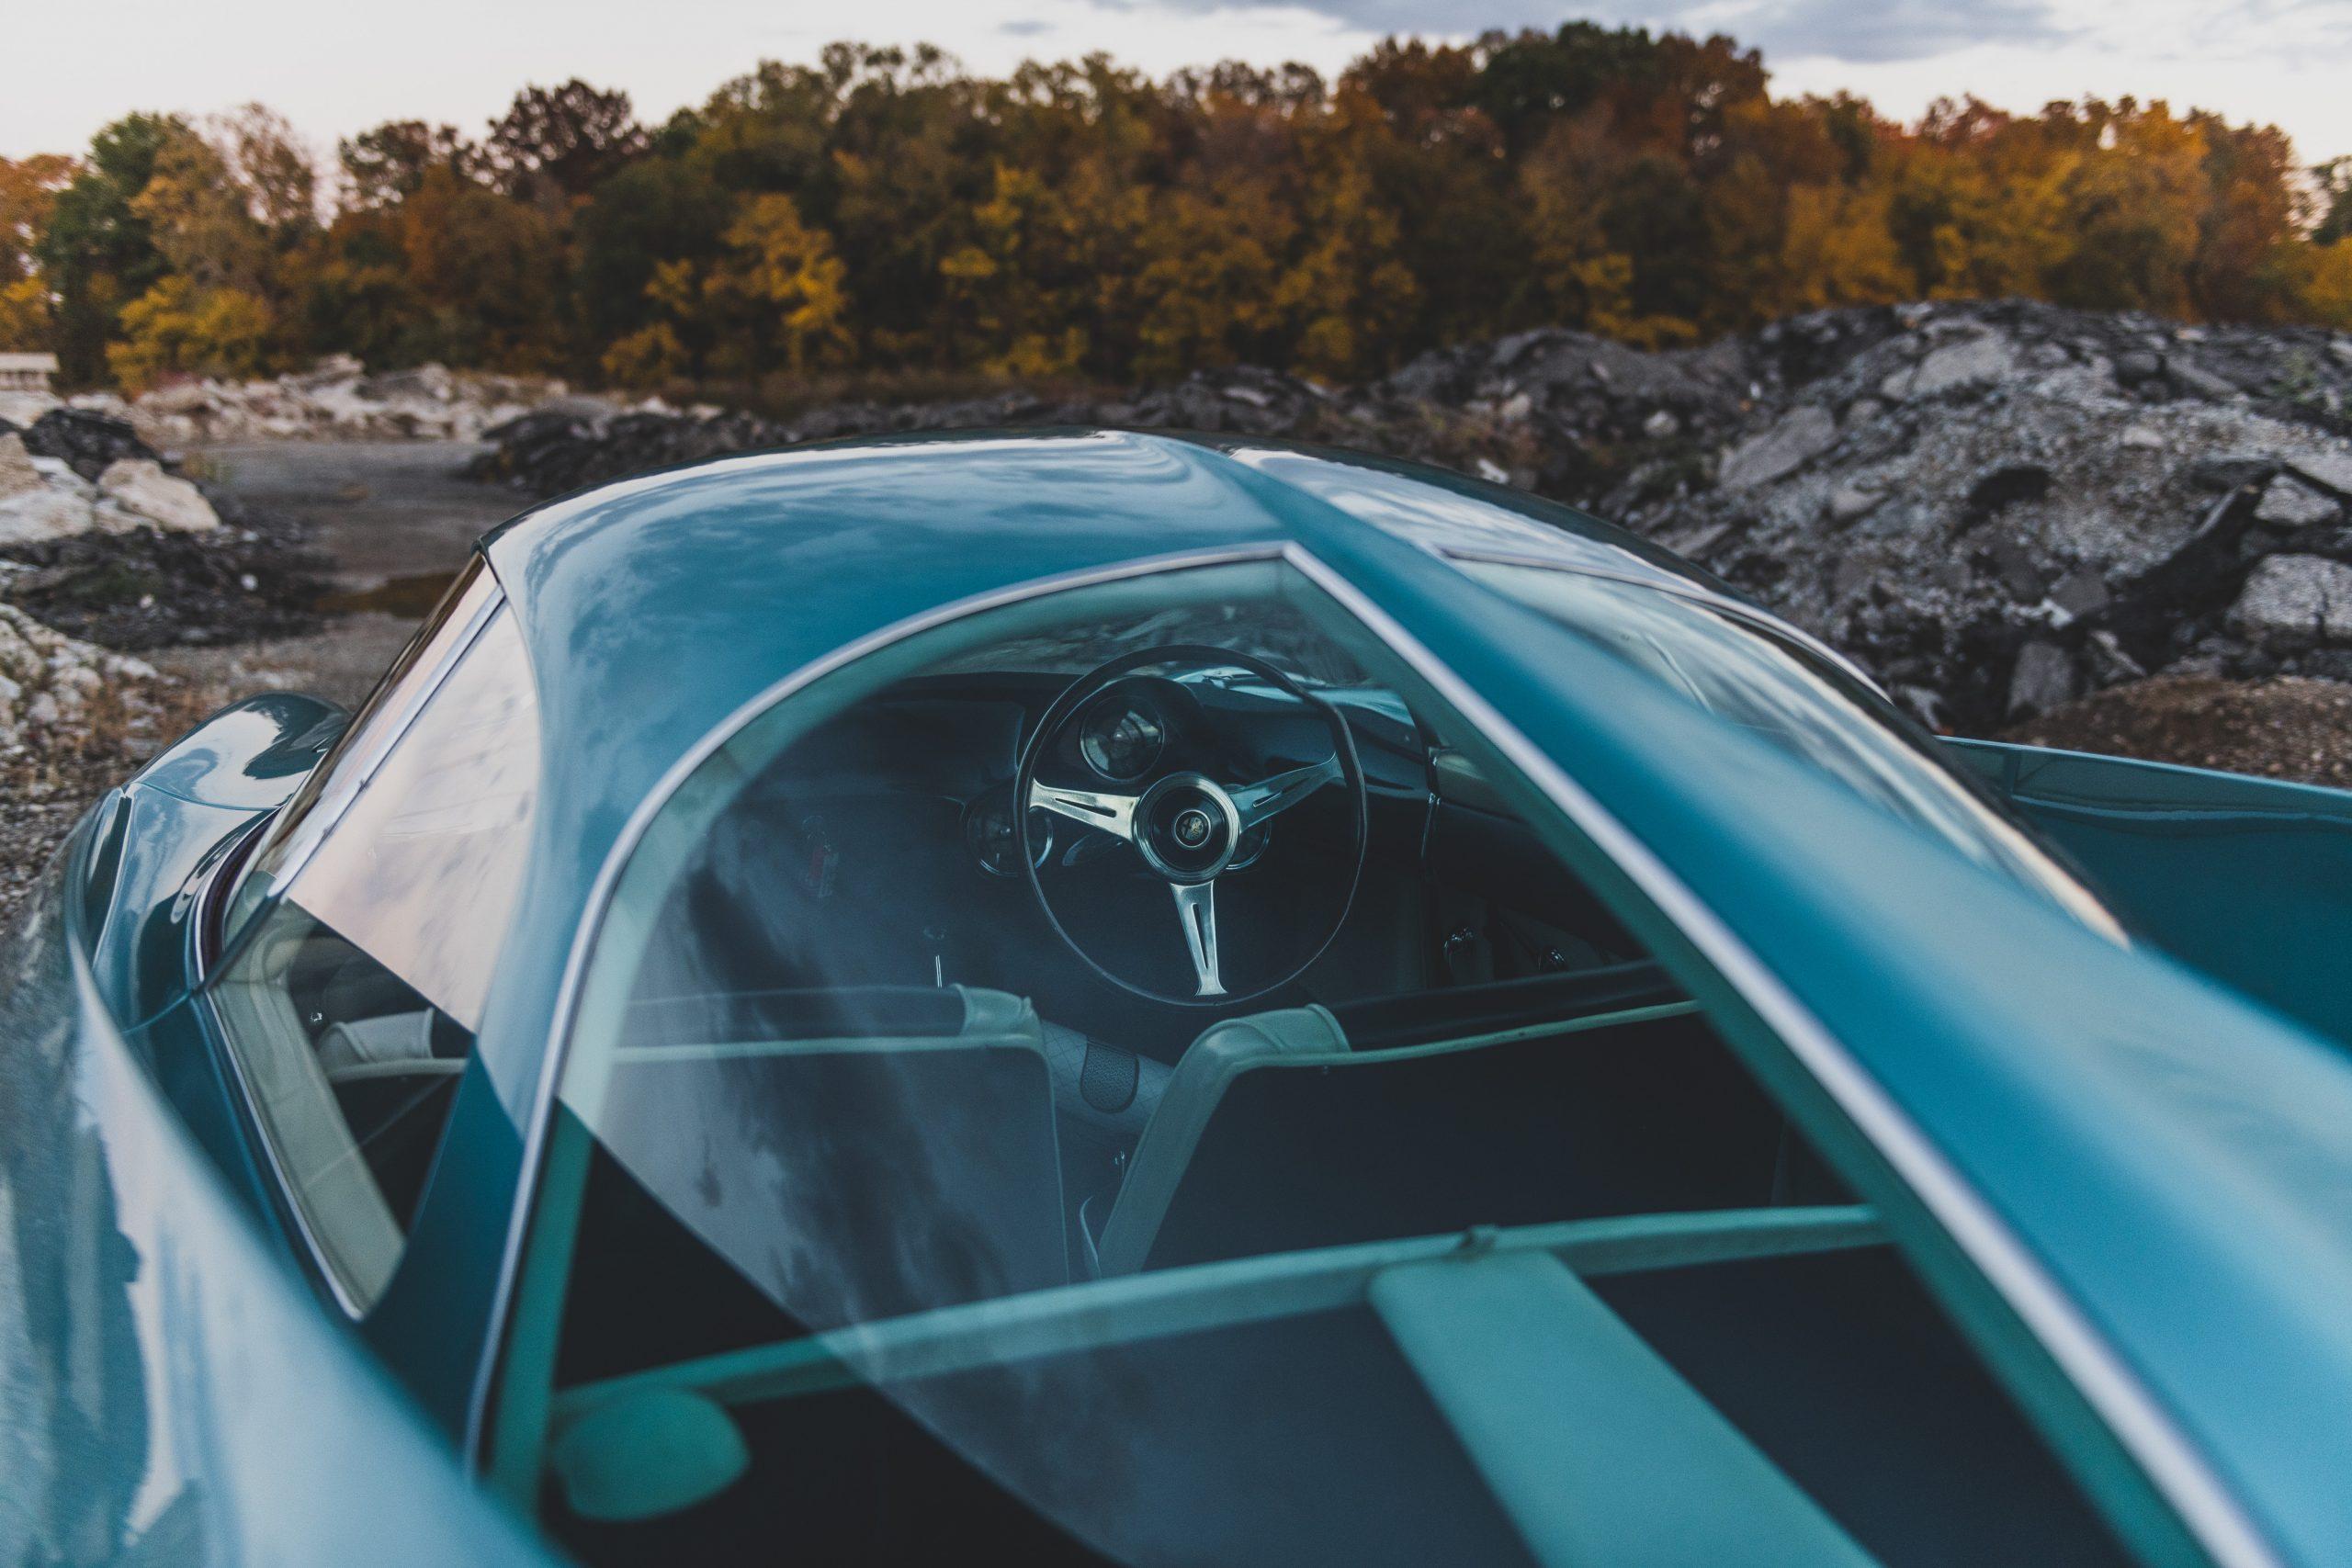 Alfa Romeo Berlina Aerodinamica Tecnica rear glass